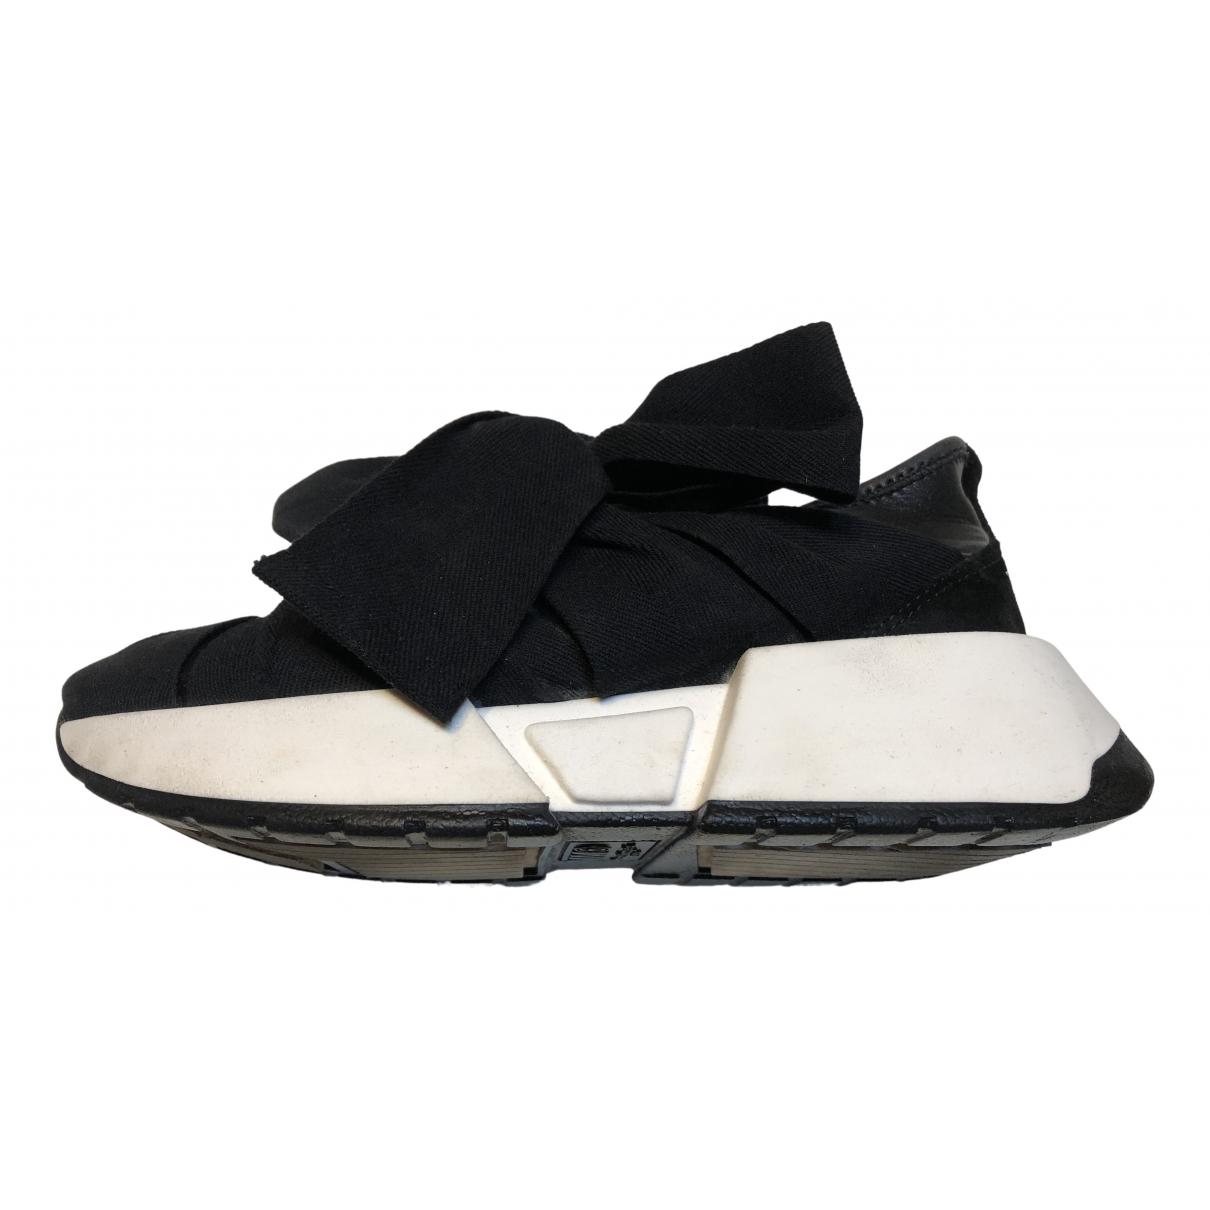 Maison Martin Margiela \N Sneakers in  Schwarz Polyester